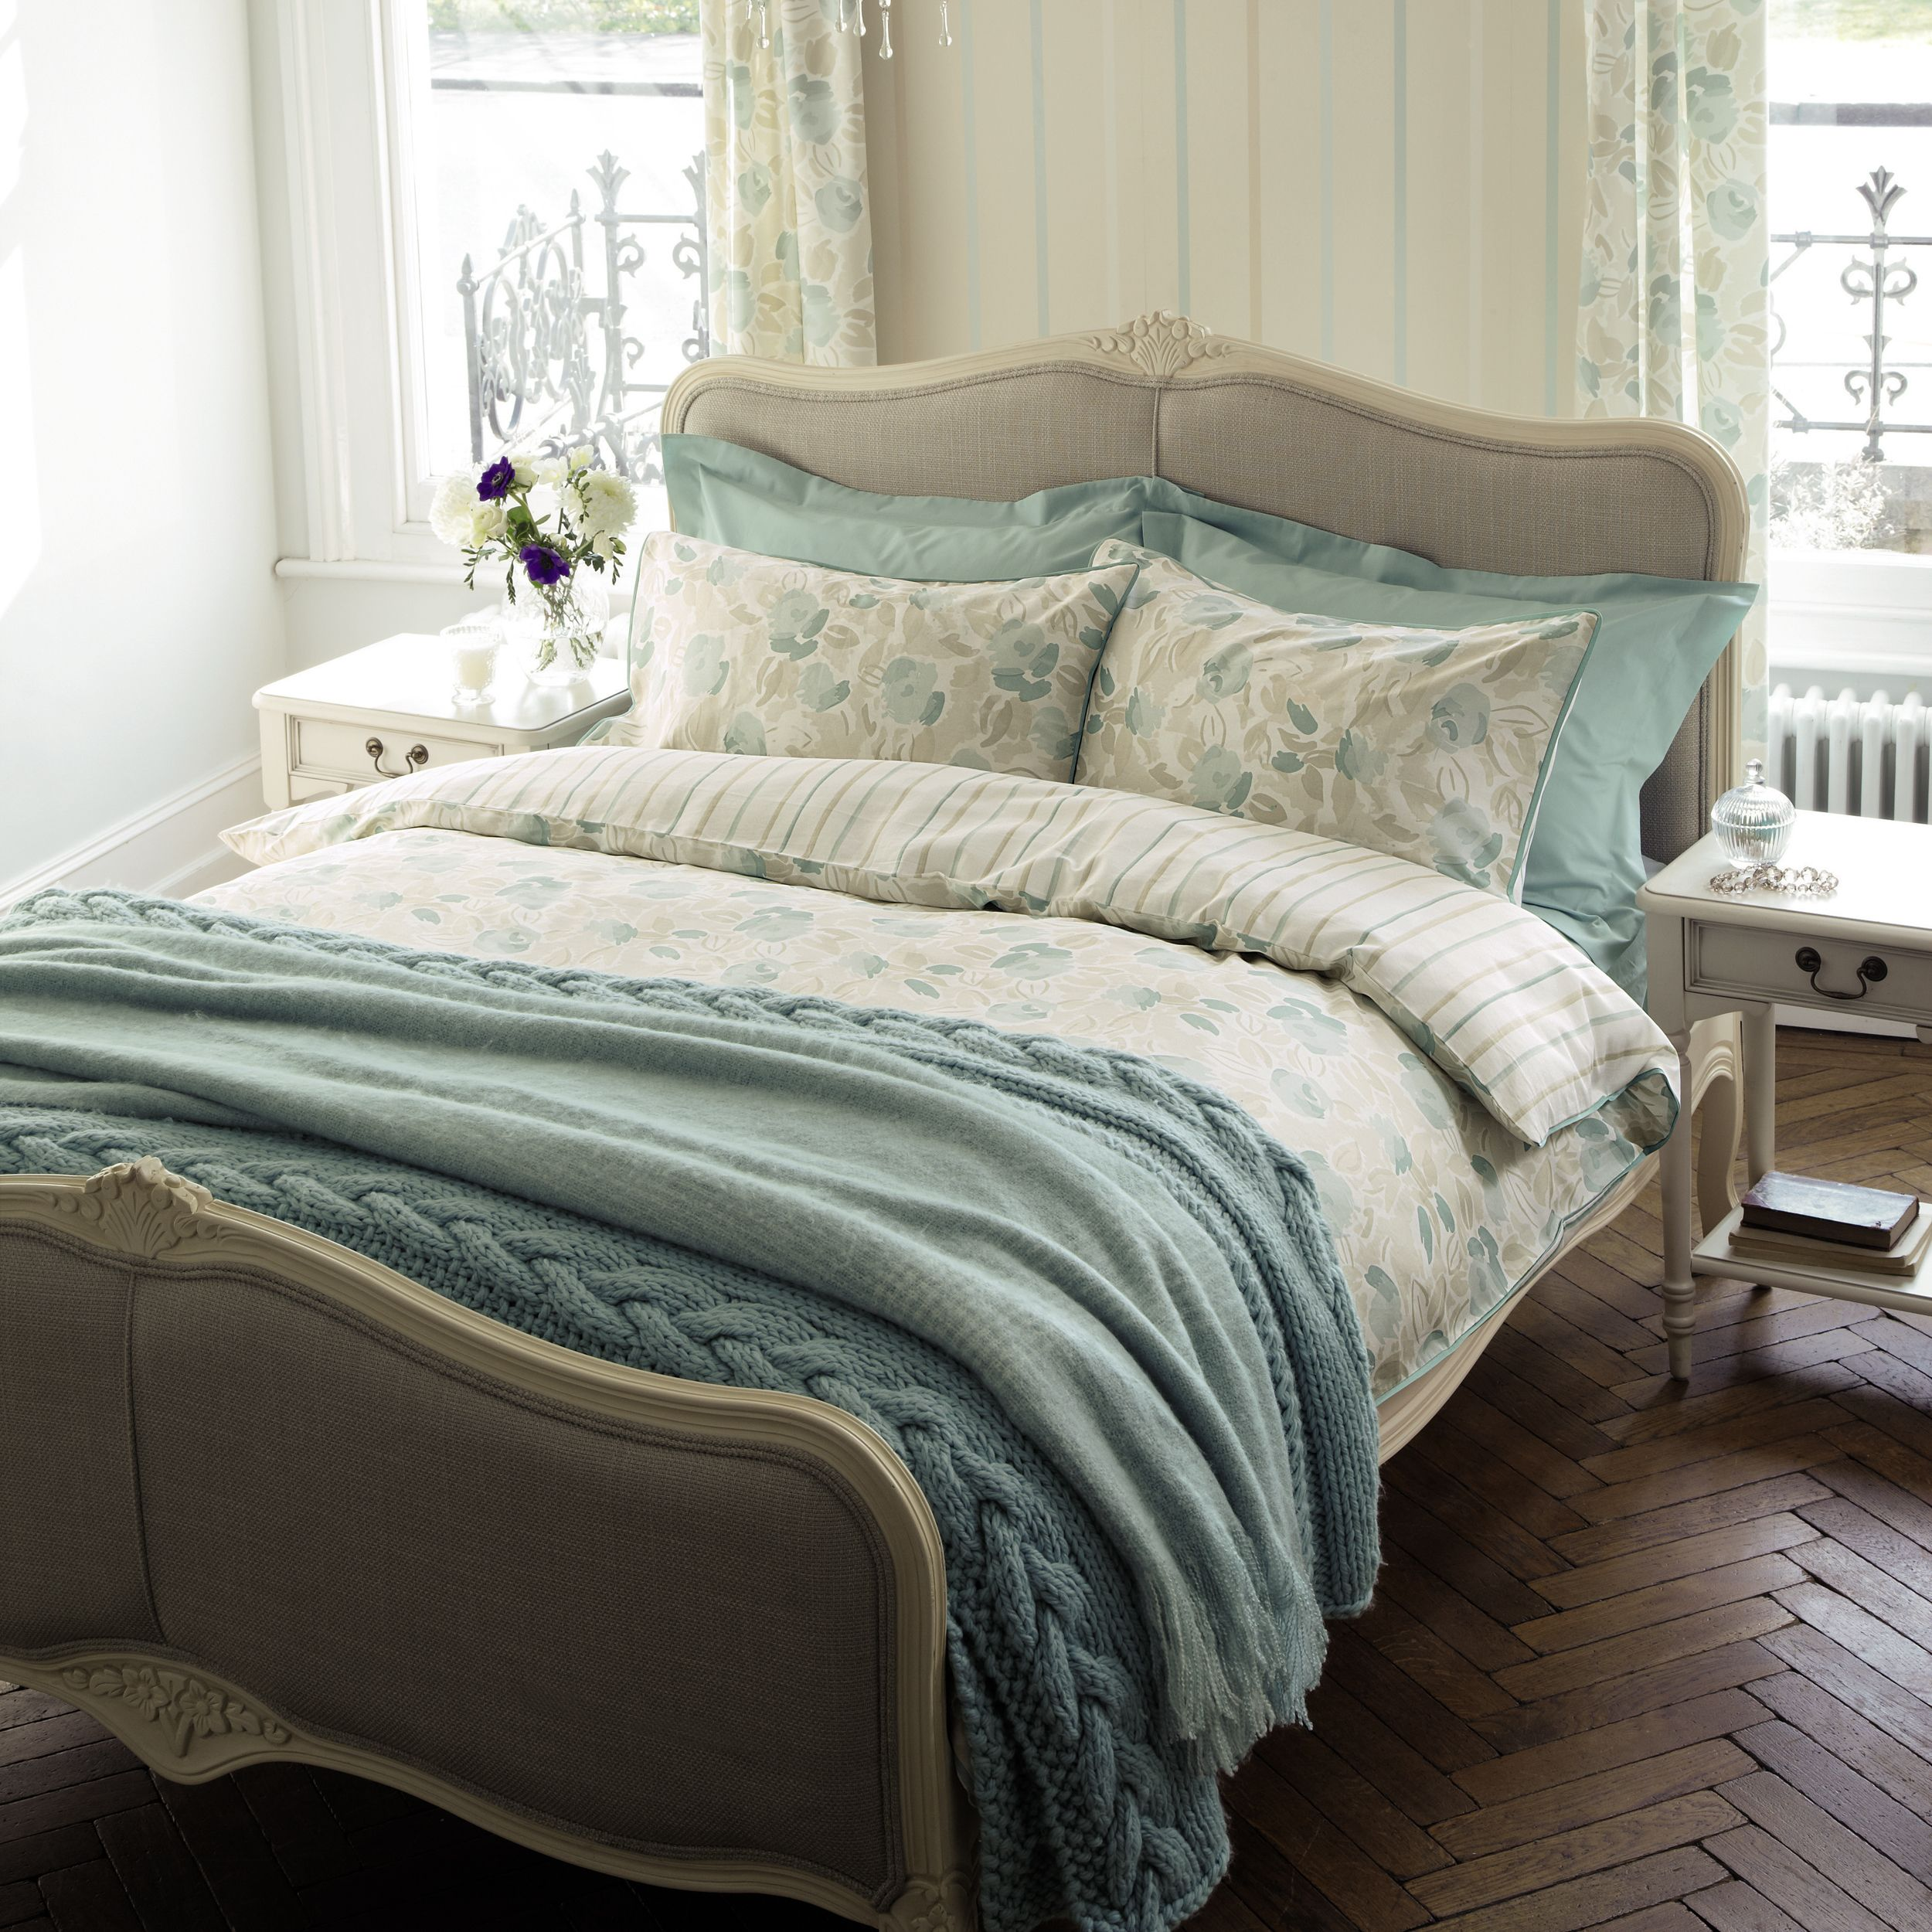 by laura ashley emma duck egg cotton bedlinen laura collection pinterest. Black Bedroom Furniture Sets. Home Design Ideas